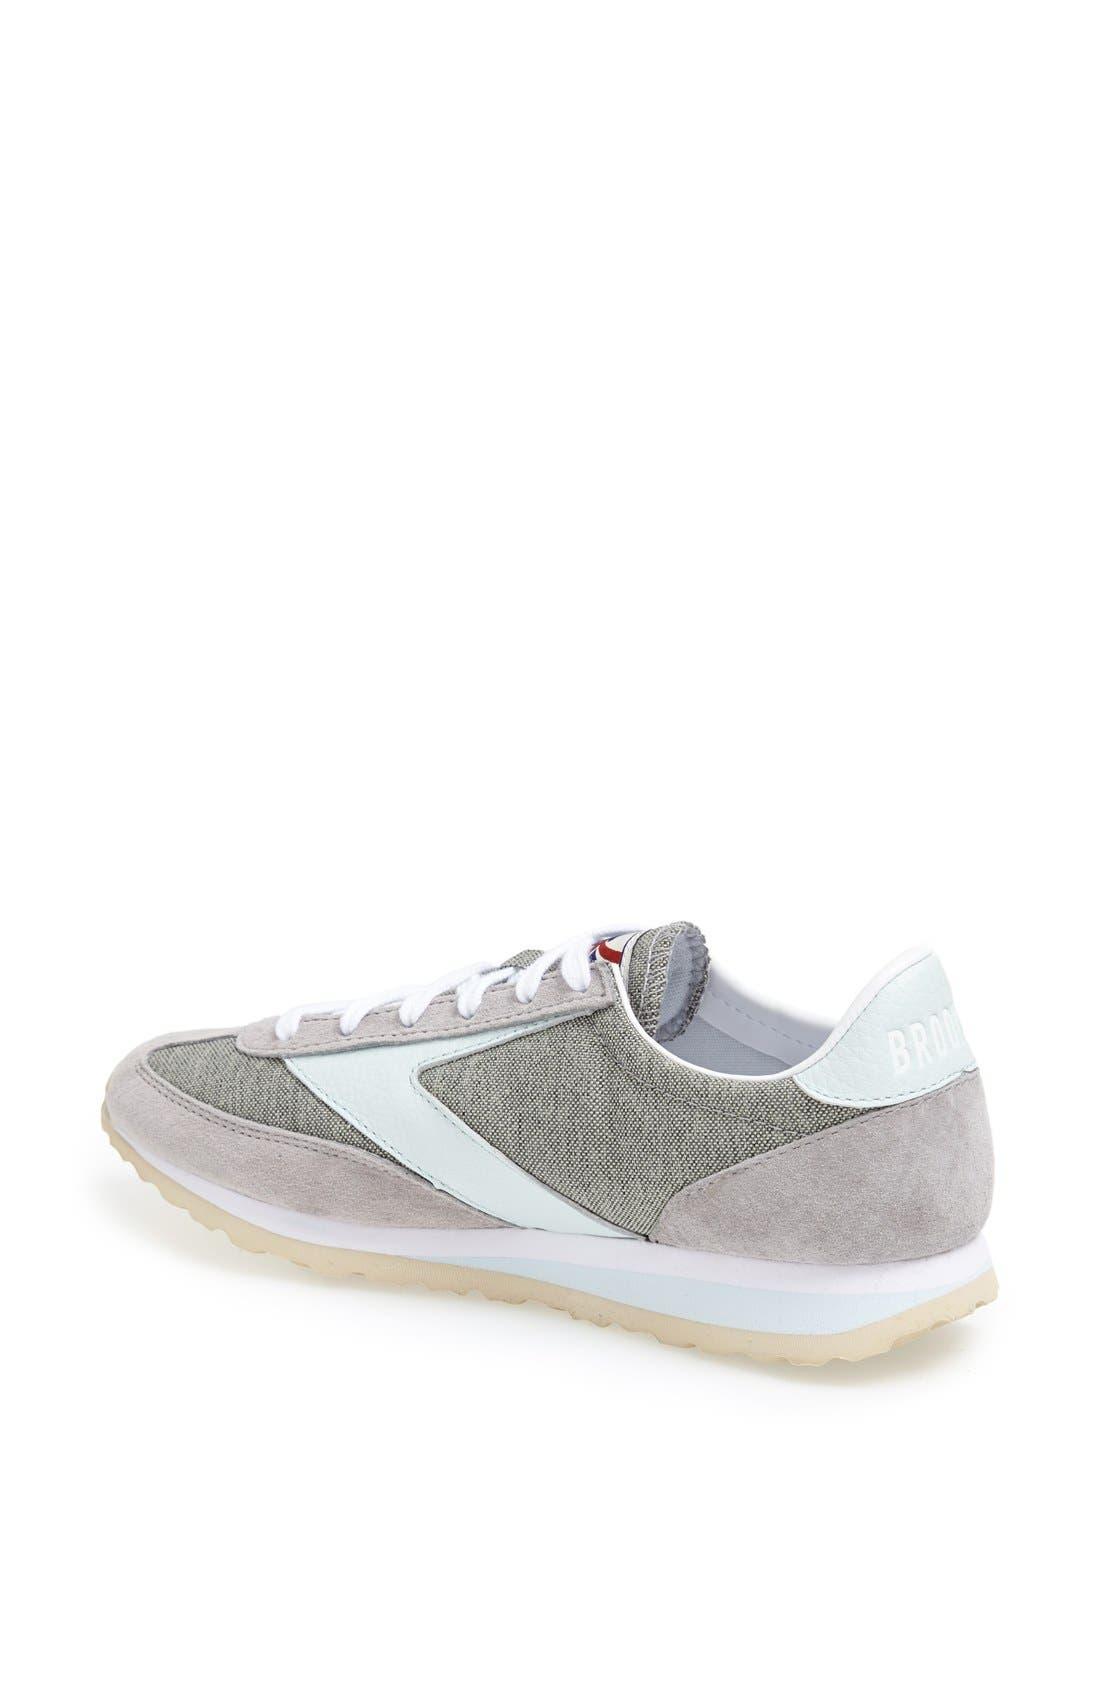 'Vanguard' Sneaker,                             Alternate thumbnail 146, color,